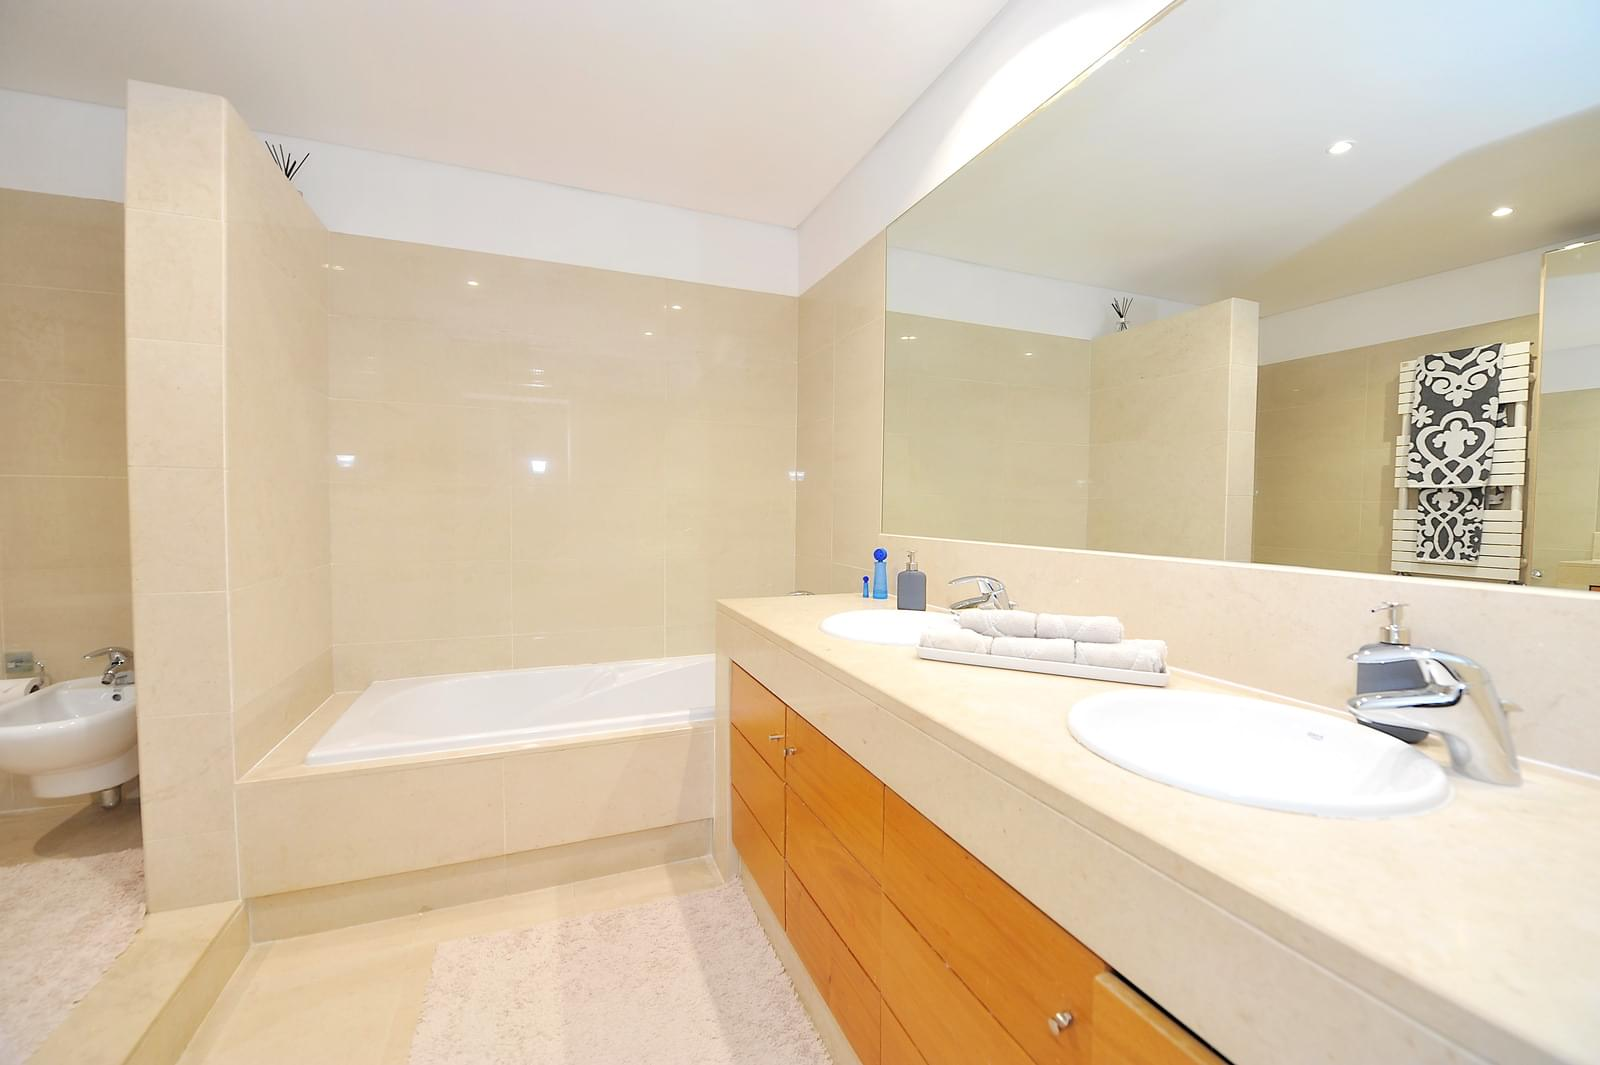 pf16896-apartamento-t4-2-oeiras-c2b1be3b-c90d-41ac-a673-9ba42f04d58b